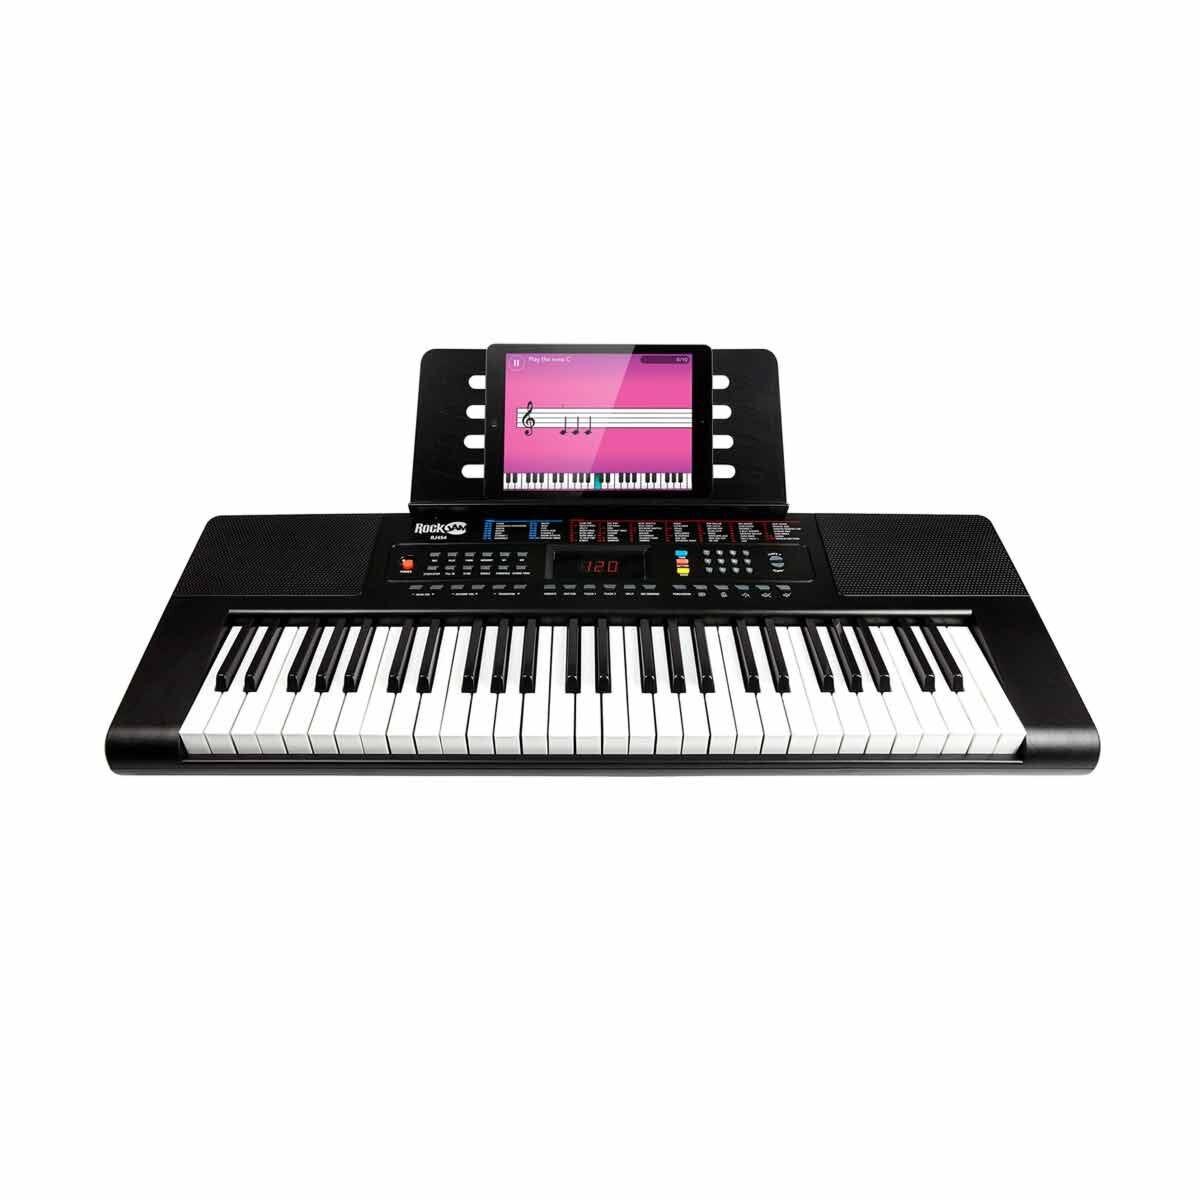 RockJam 54 Key Music Keyboard